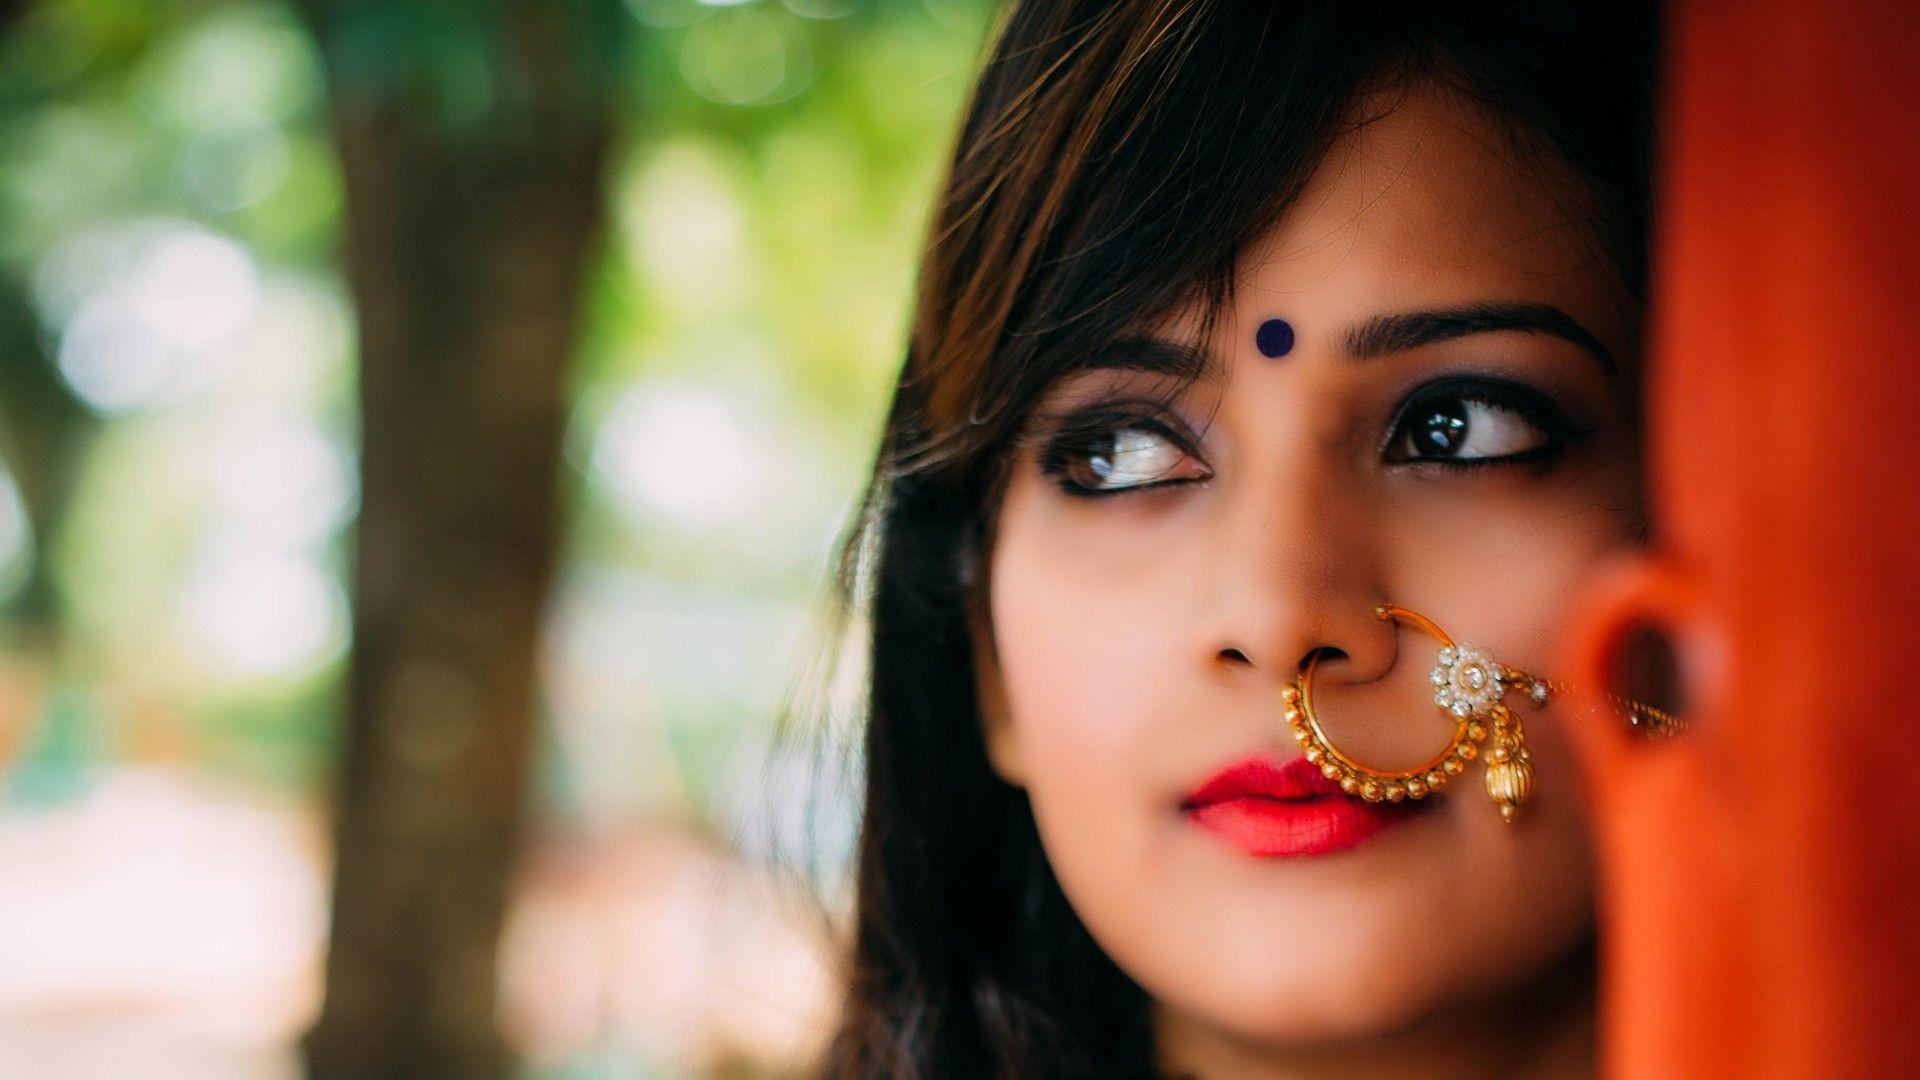 Indian Girls Desktop Wallpapers Top Free Indian Girls Desktop Backgrounds Wallpaperaccess